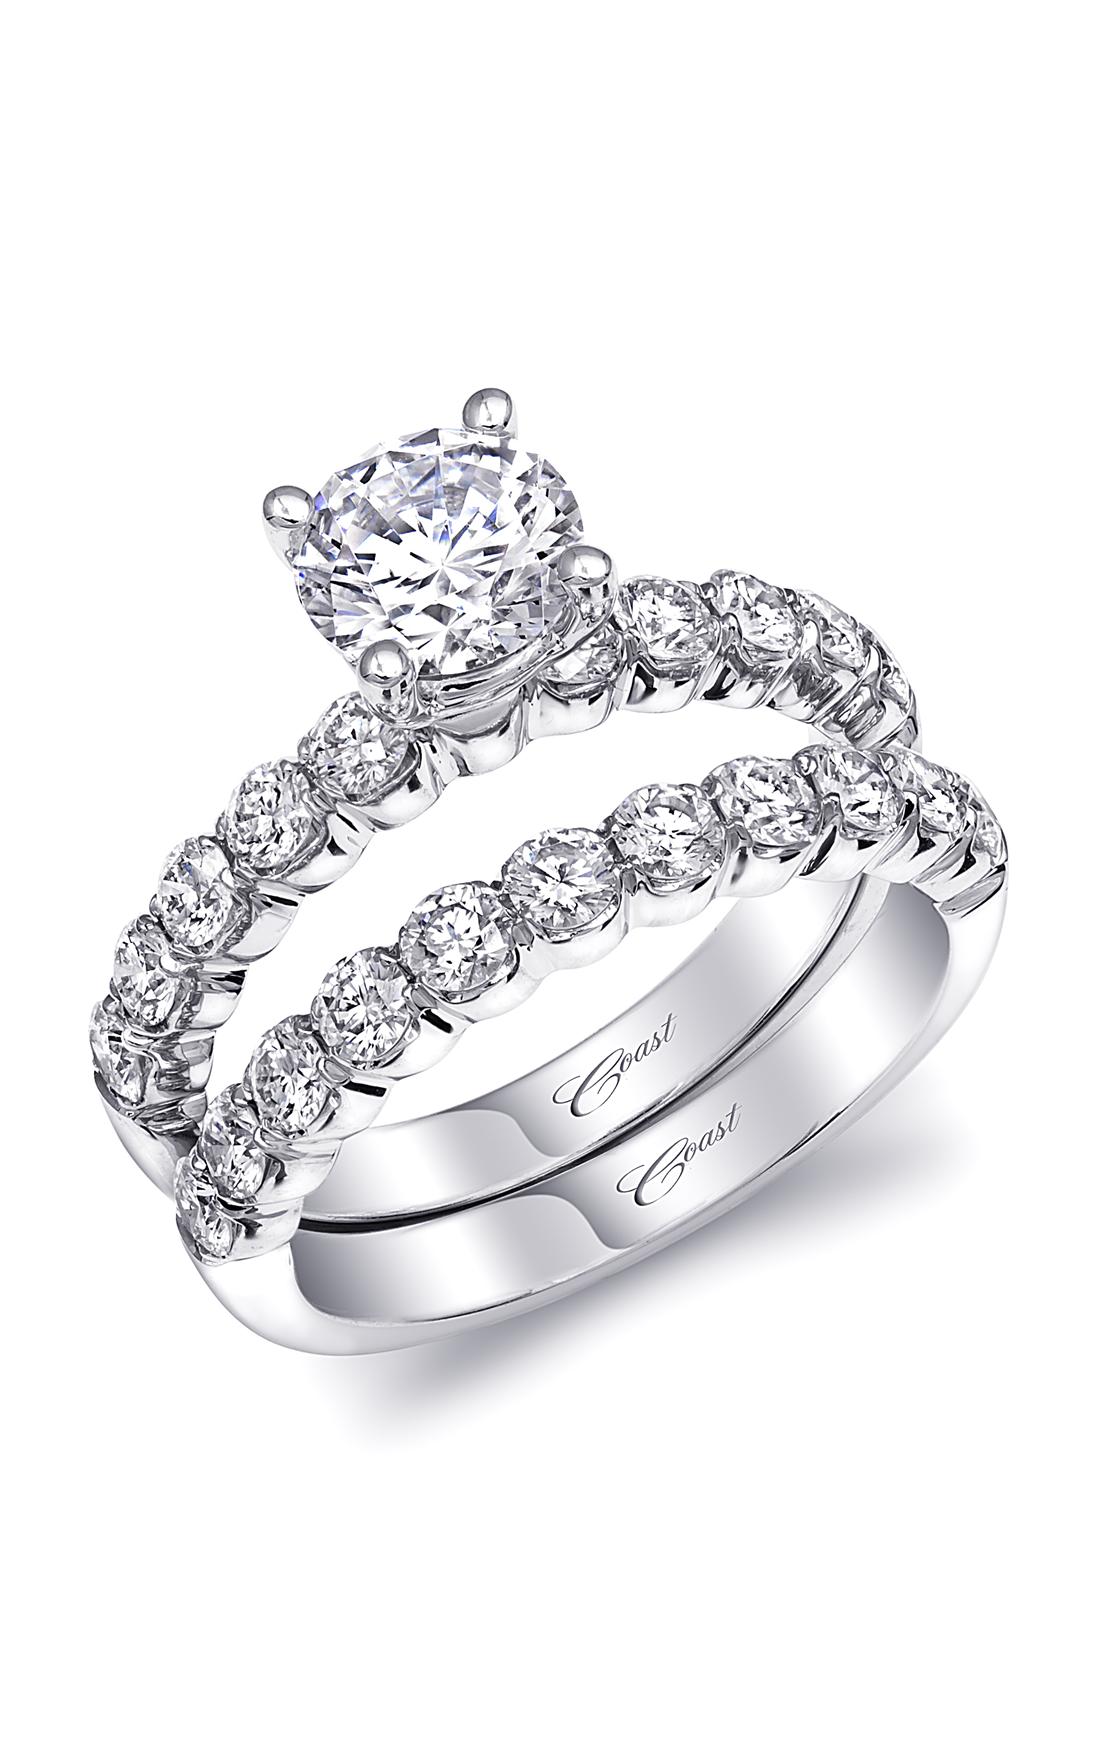 Coast Diamond Charisma  LS10006 product image